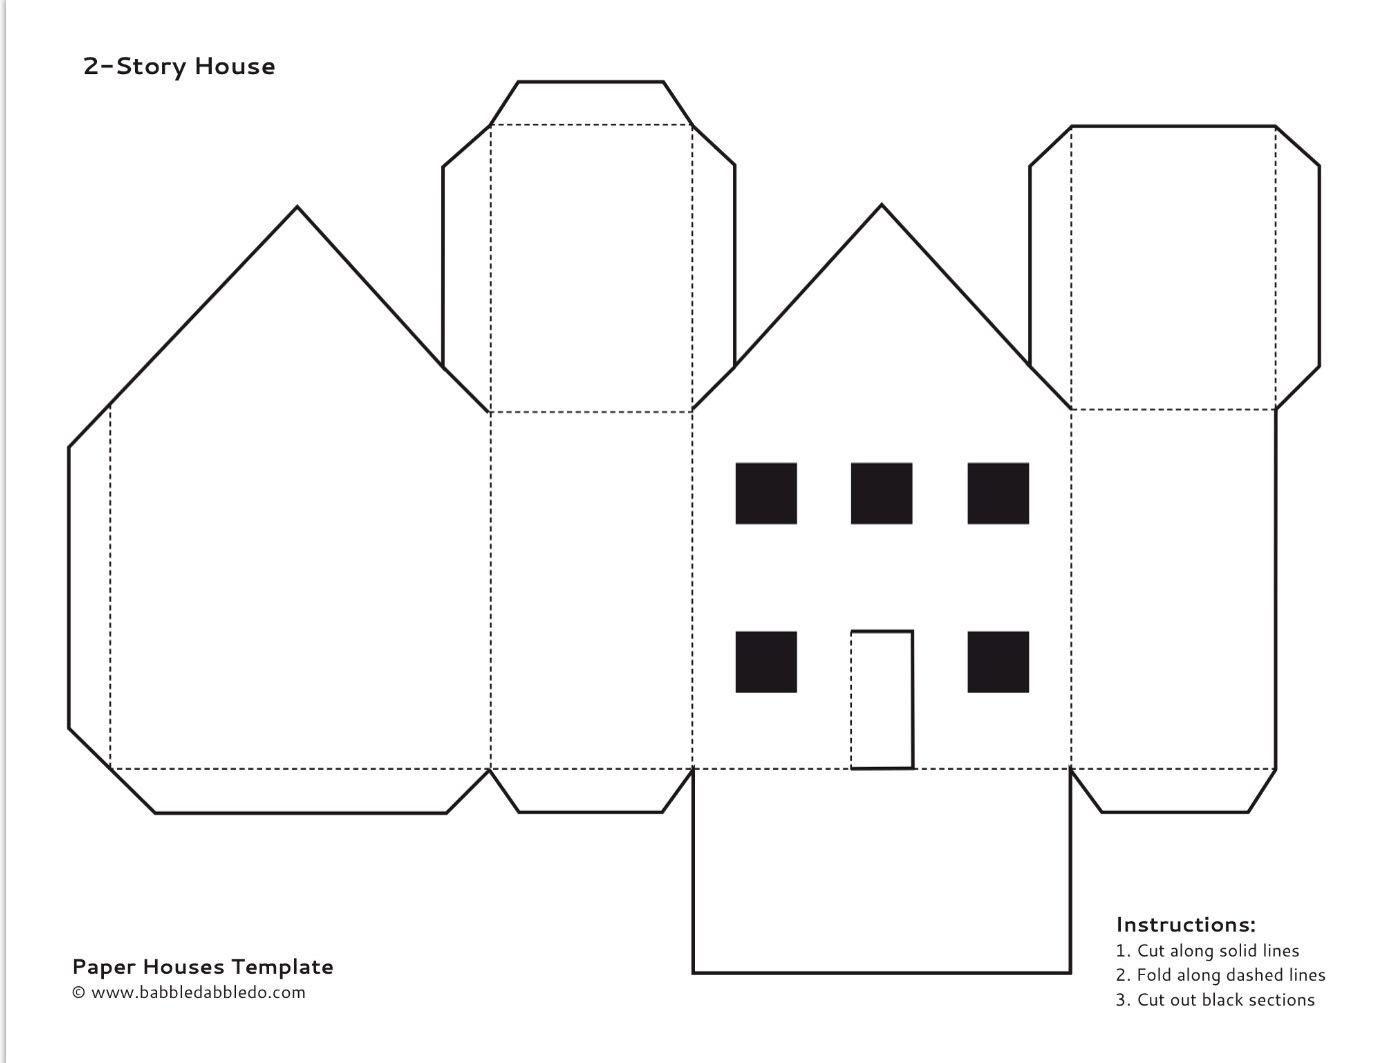 Paper House Template 2 Paper House Template House Template Paper Doll House